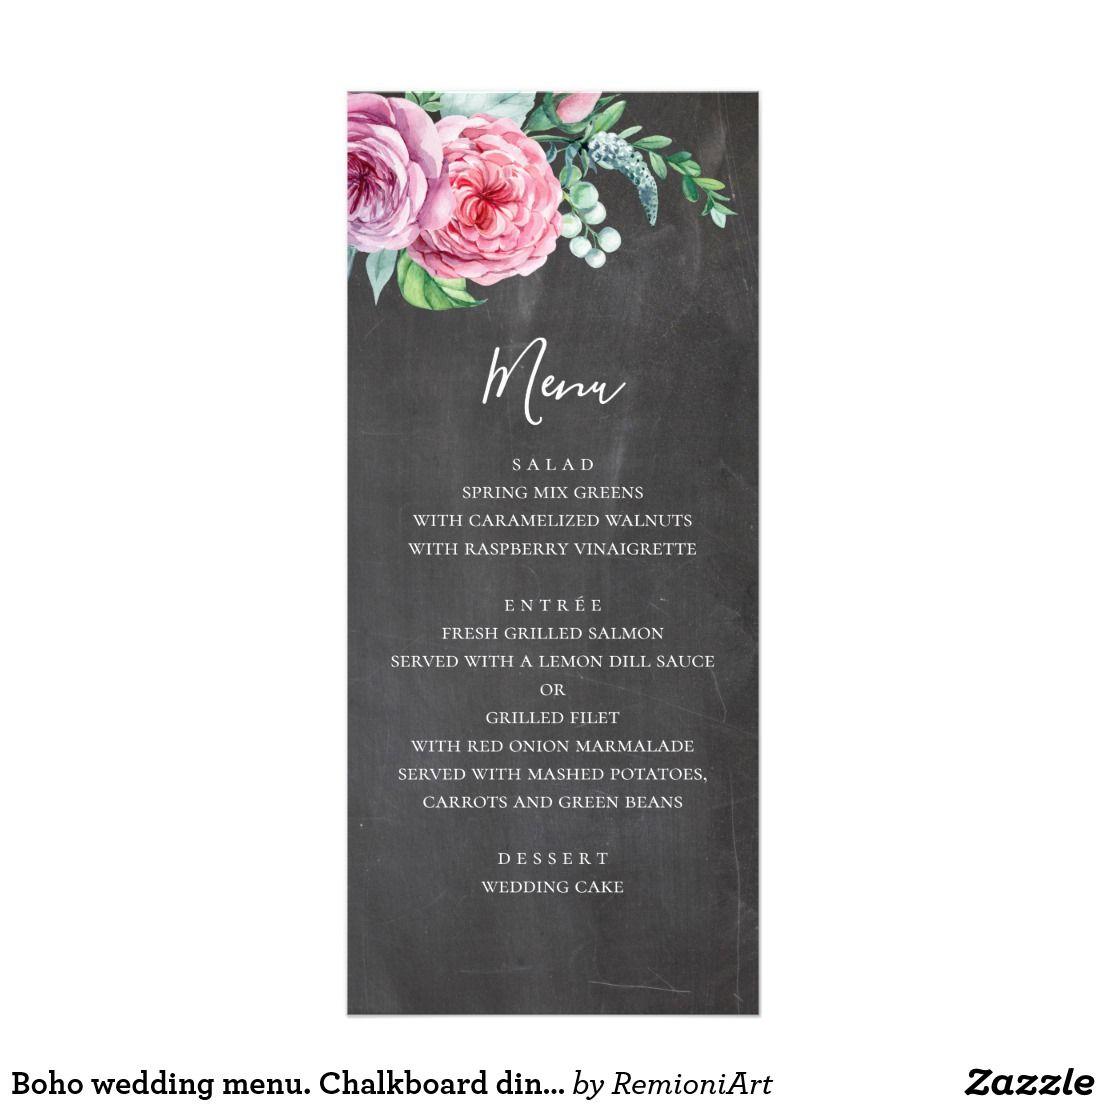 Boho Wedding Menu Chalkboard Dinner Menu Flowers Rack Card My